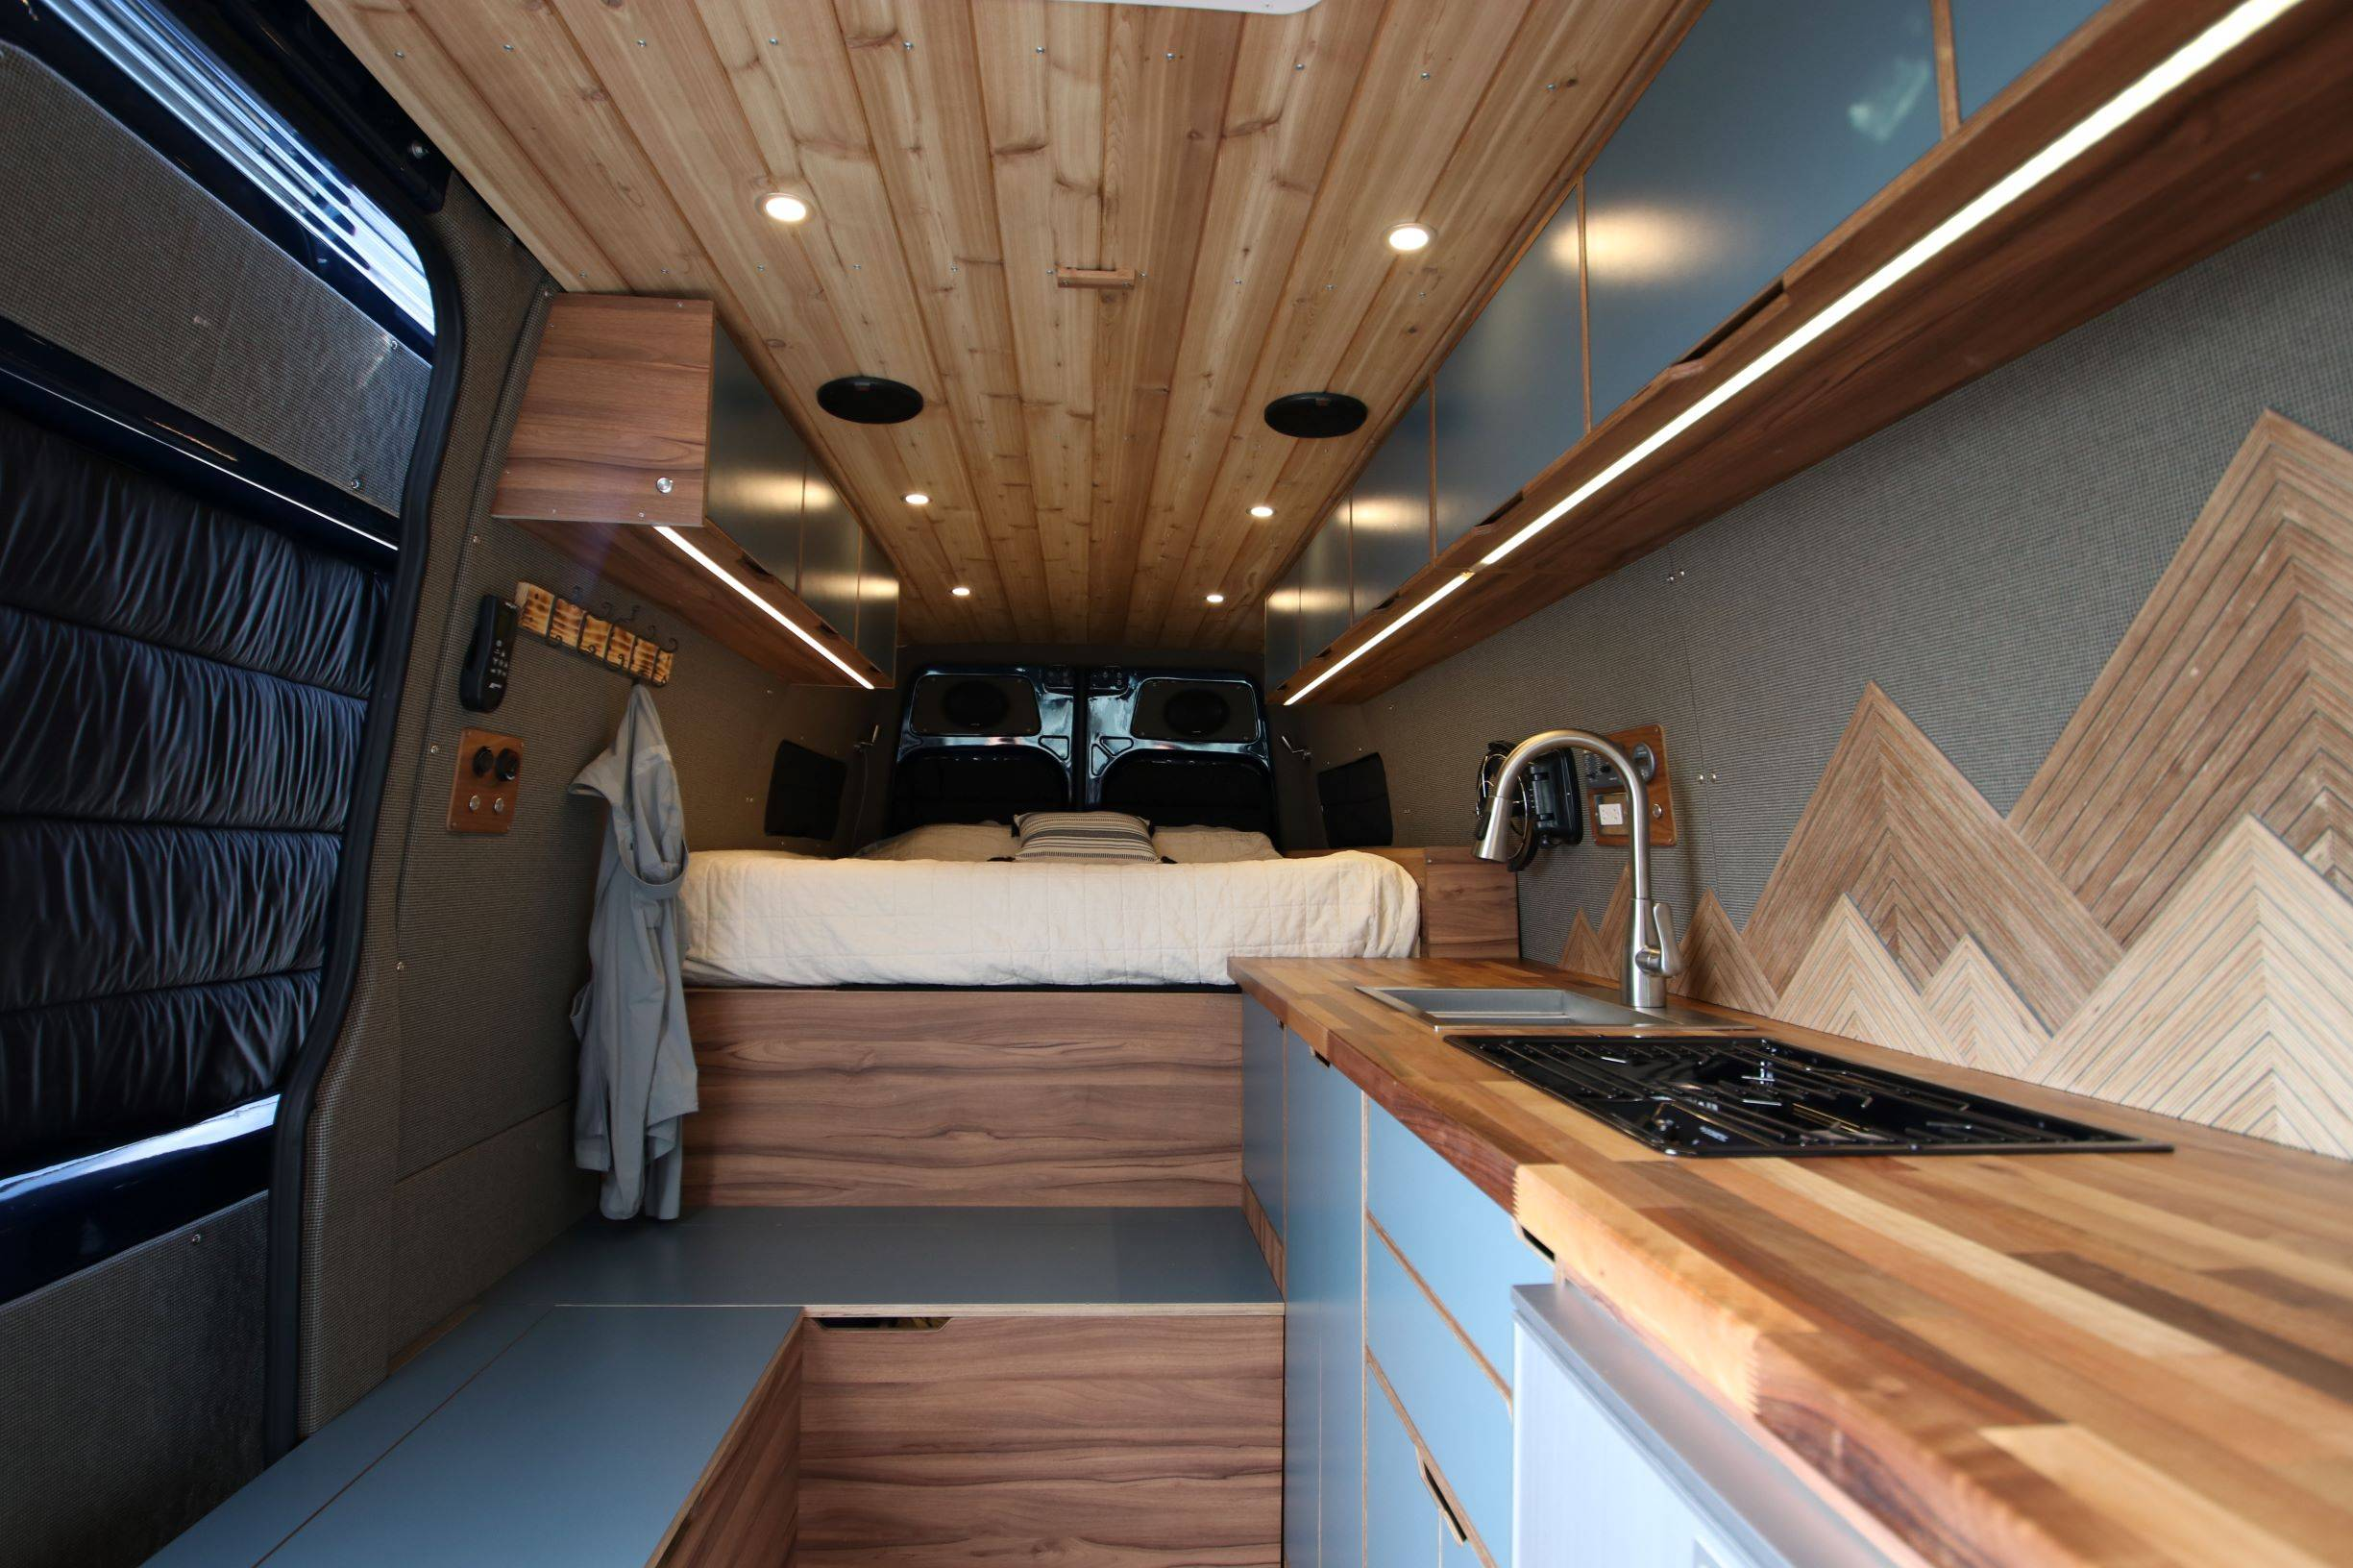 The Outpost - Mercedes Sprinter 170 Luxury Van Conversion Interior View - The Vansmith in Boulder, Colorado